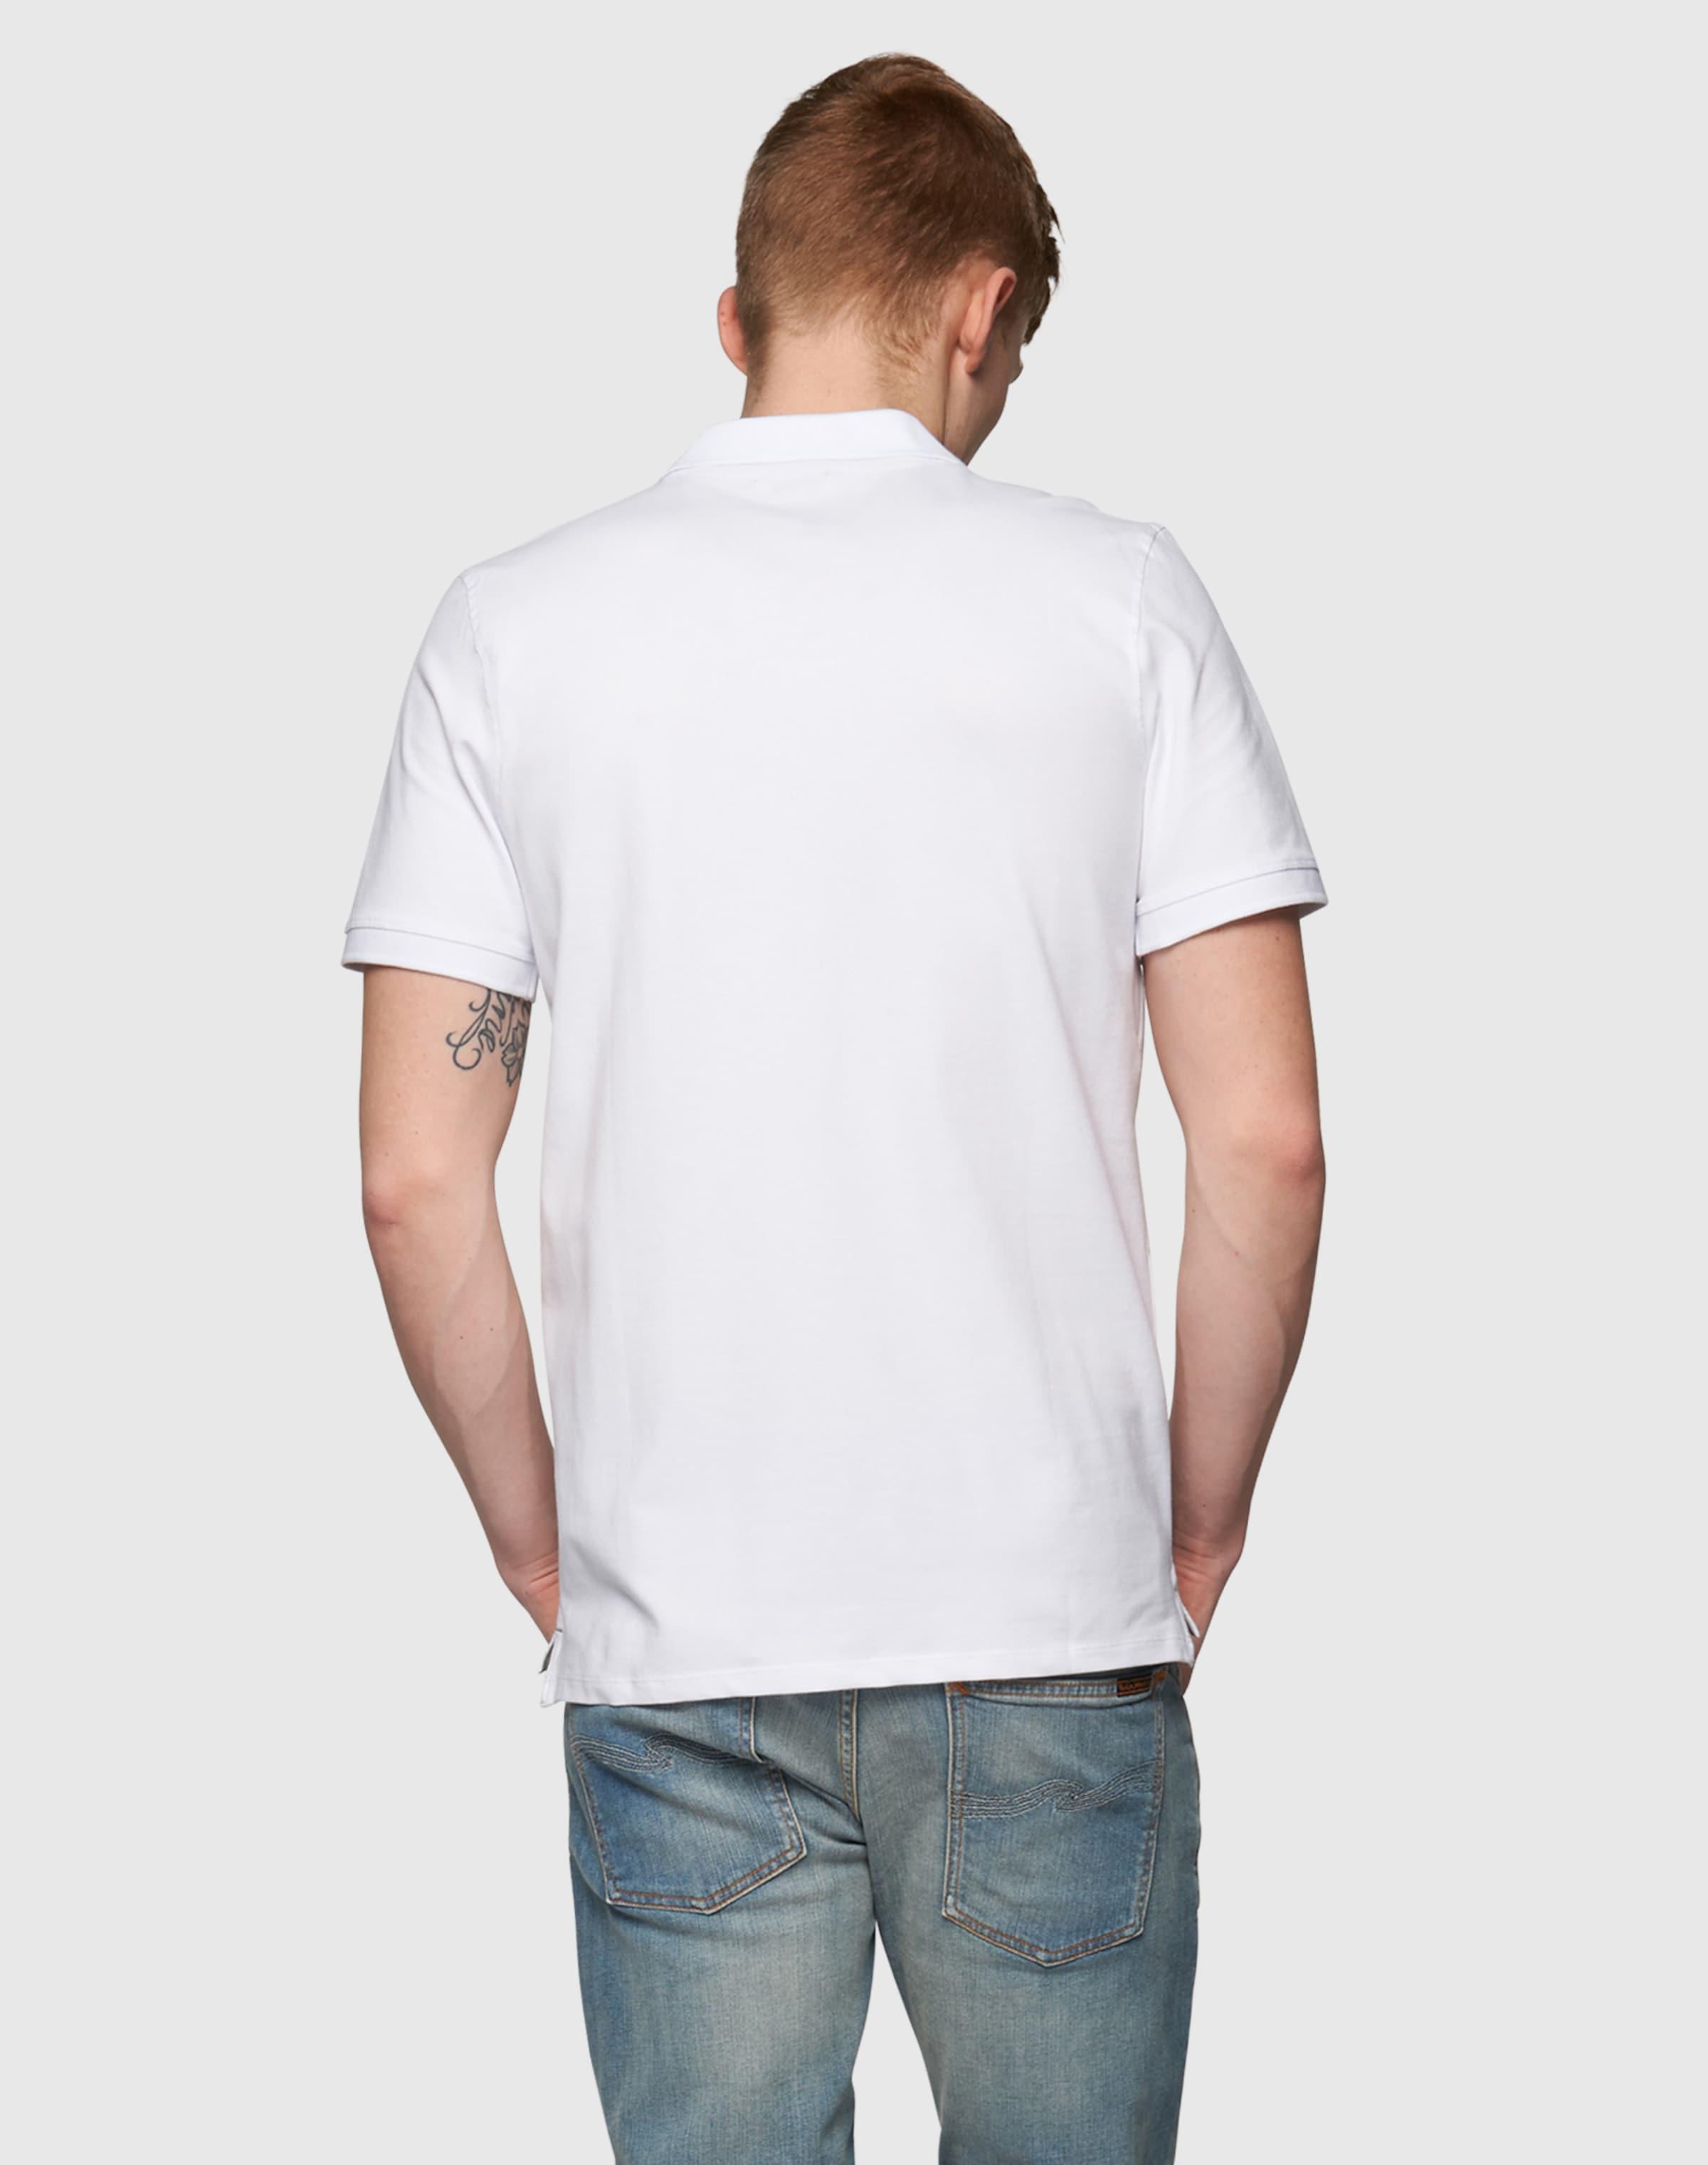 SELECTED HOMME Poloshirt 'SH Daro' Geniue Händler Günstig Online Großhandelspreis Online Kaufladen Großer Verkauf Günstig Online Kaufen Billig Kaufen KPHvp6CWyd